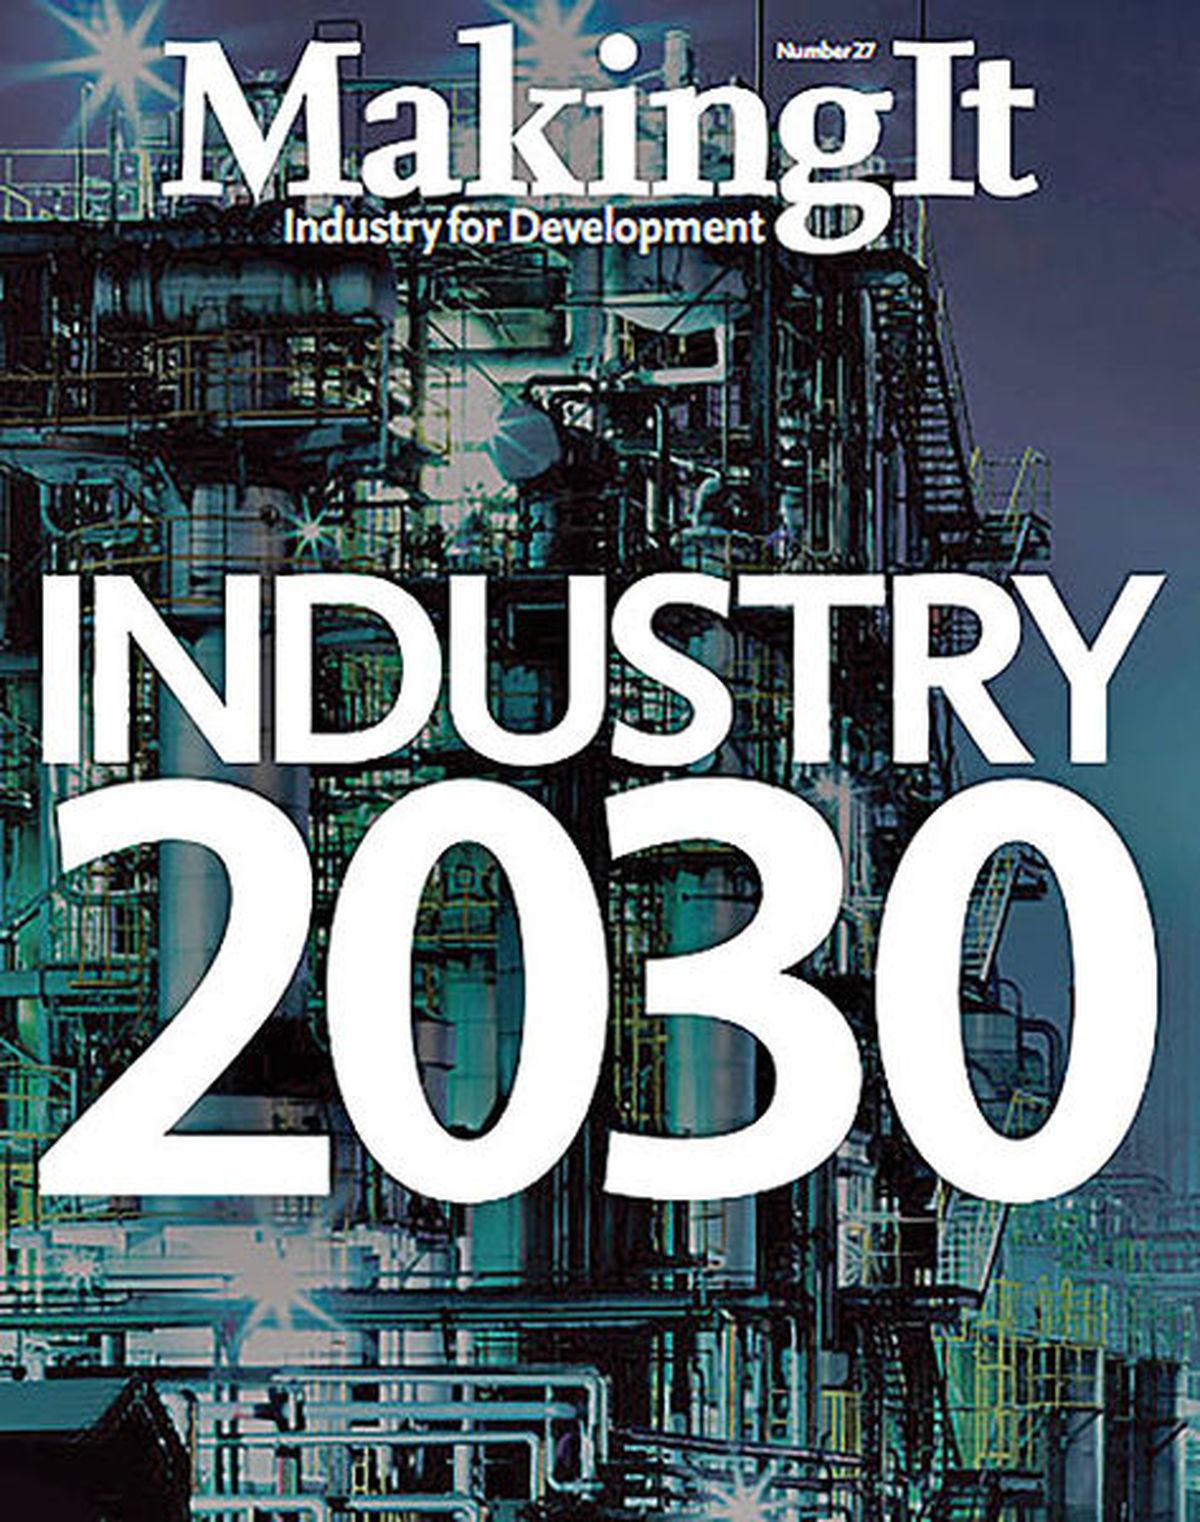 صنعت توسعه محور تا ۲۰۳۰